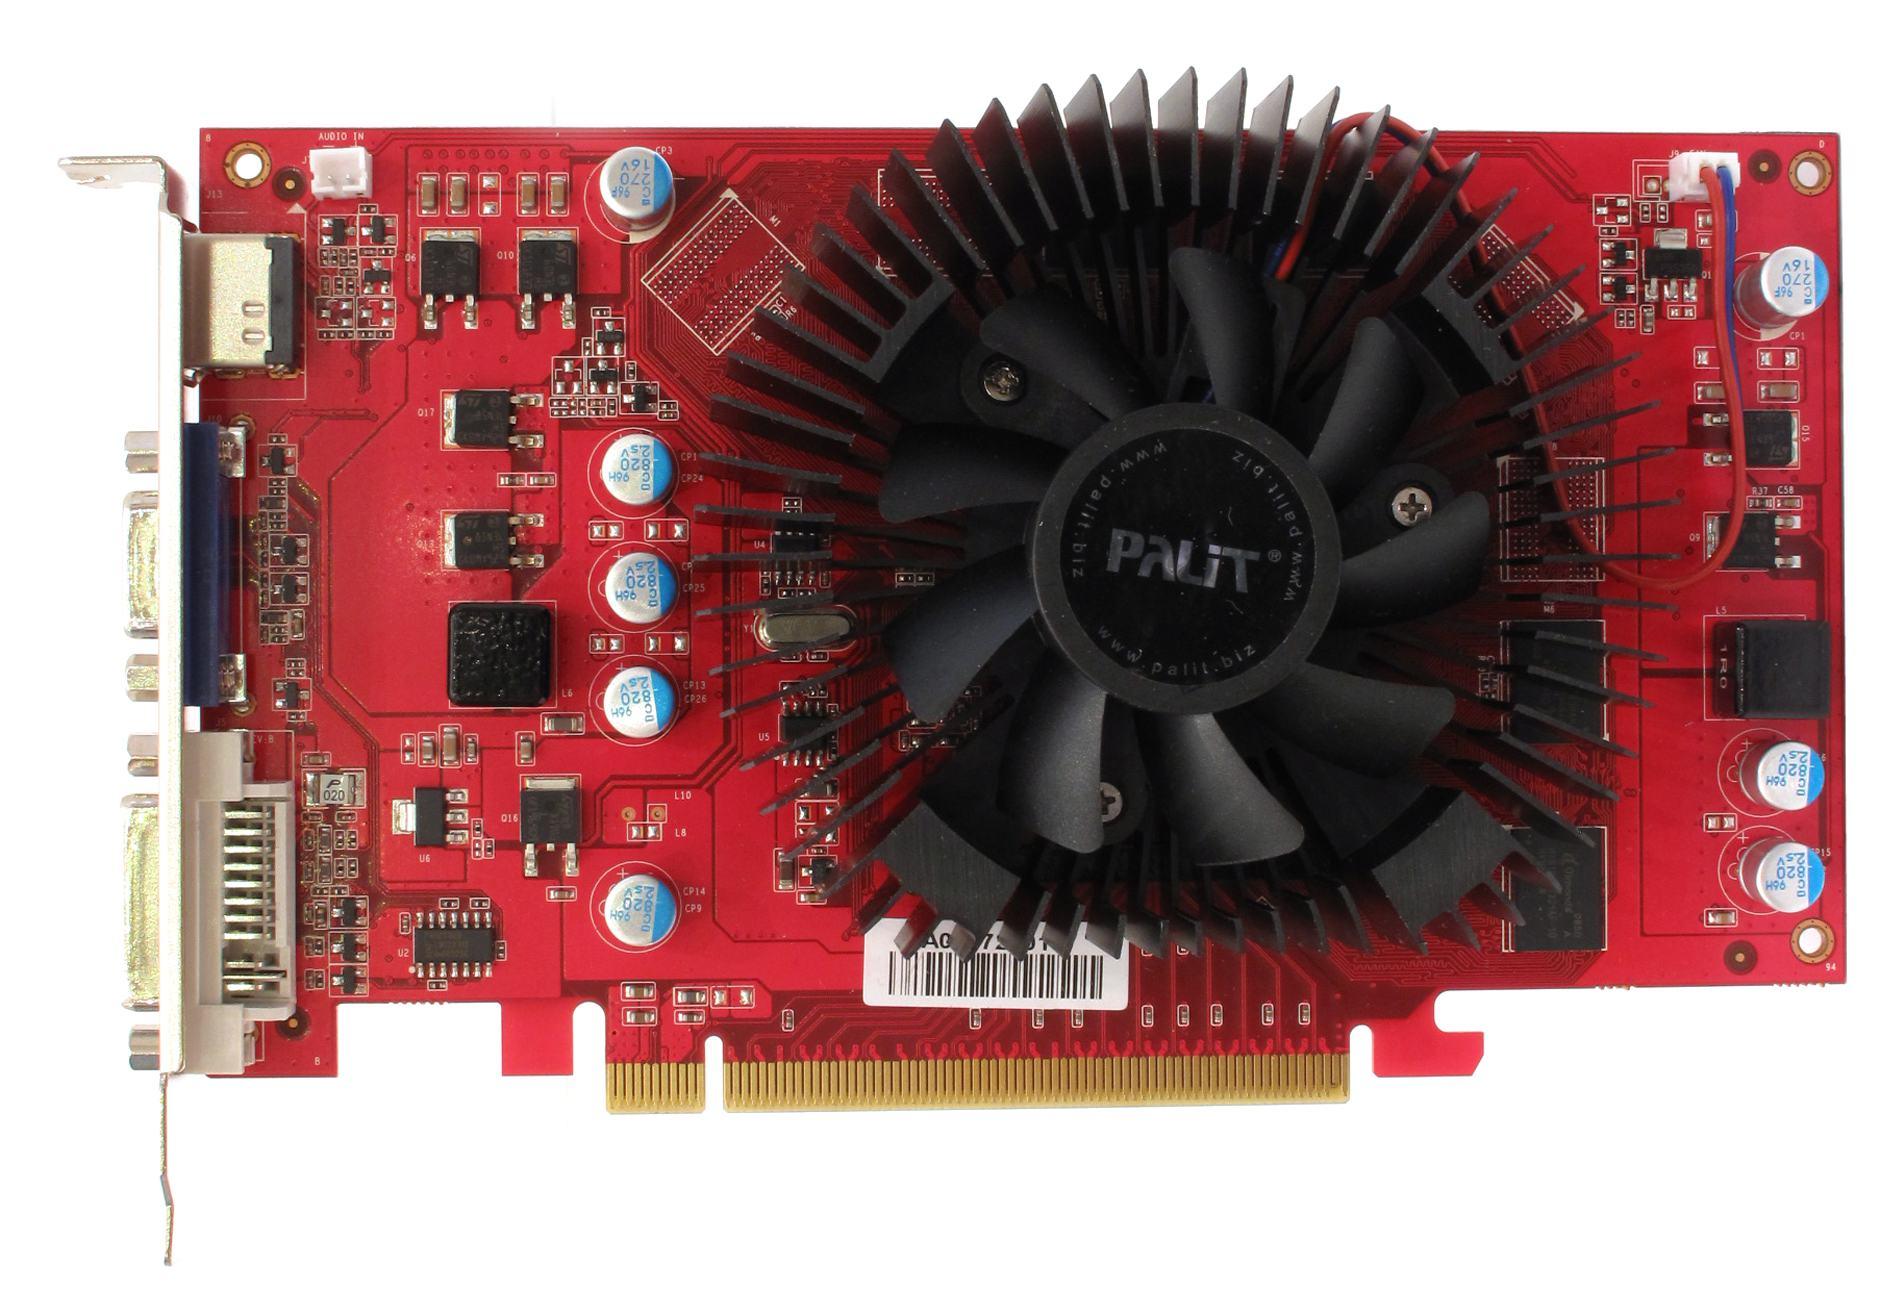 Geforce 9600 gso 512 драйвера — roadz.